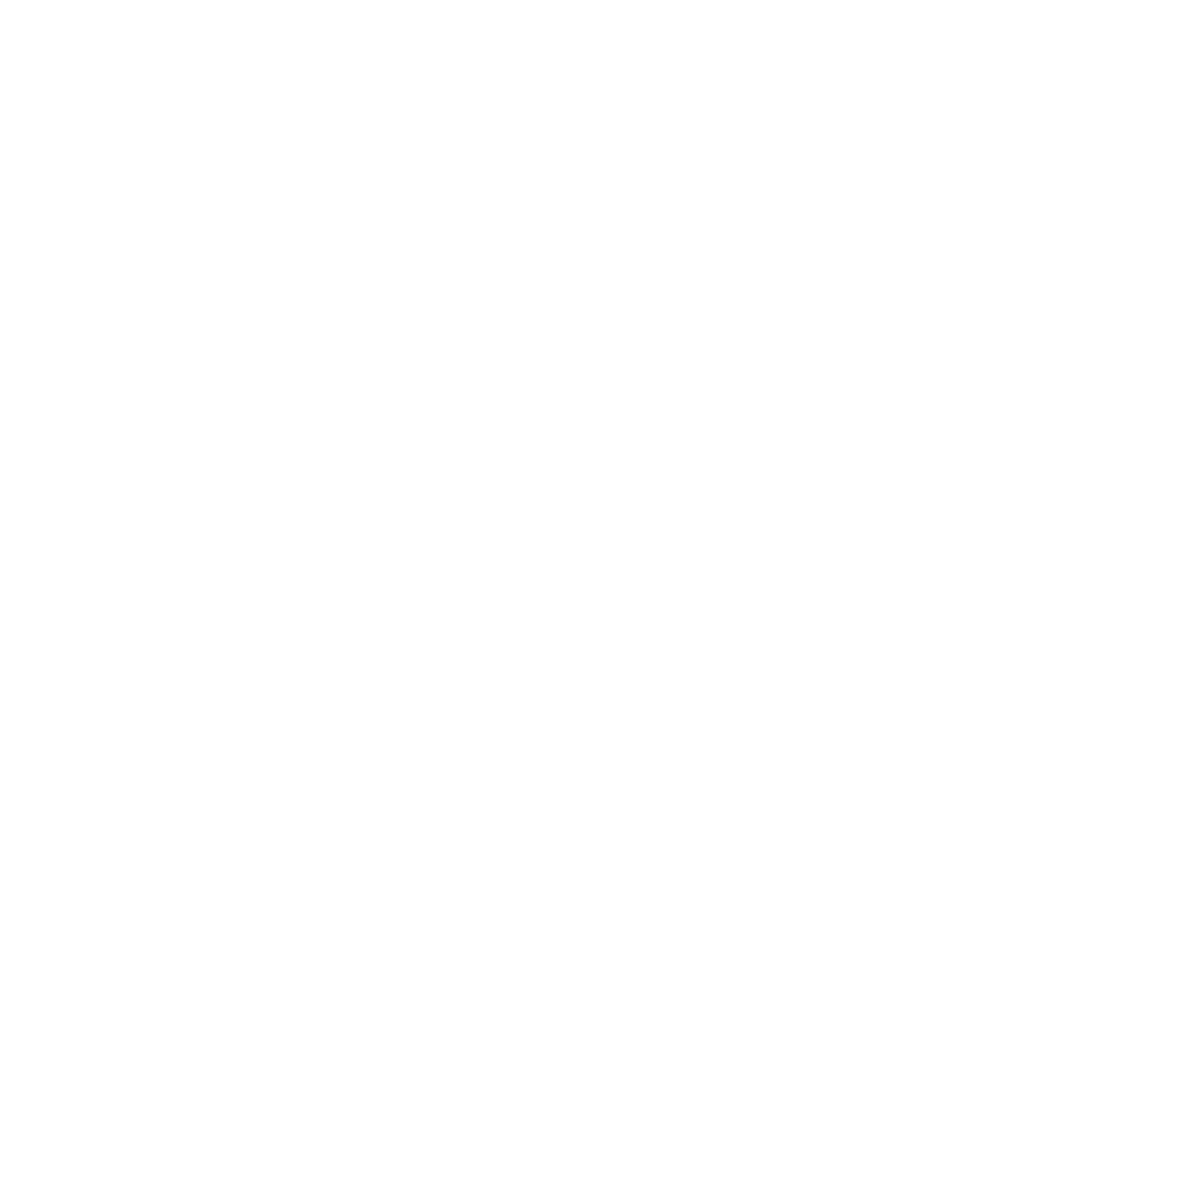 Collierville church of Christ in Collierville, TN